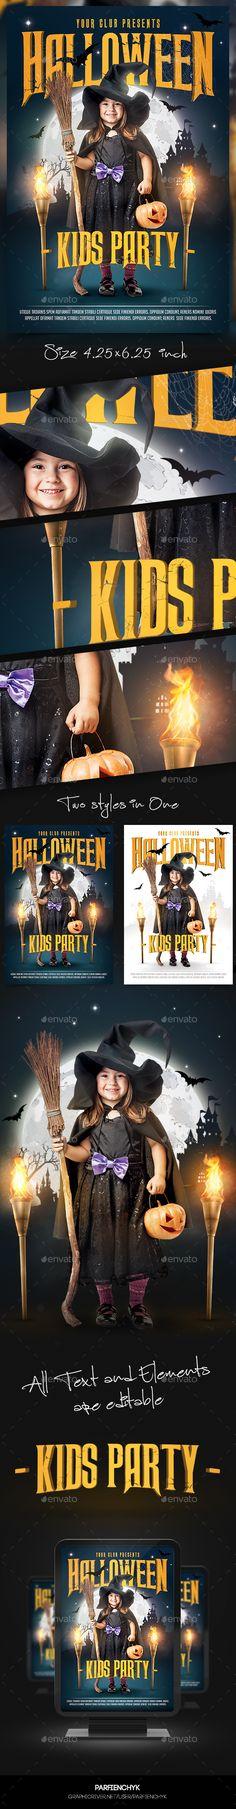 Kids Halloween Flyer Template PSD #design Download: http://graphicriver.net/item/kids-halloween-flyer-template/13065793?ref=ksioks